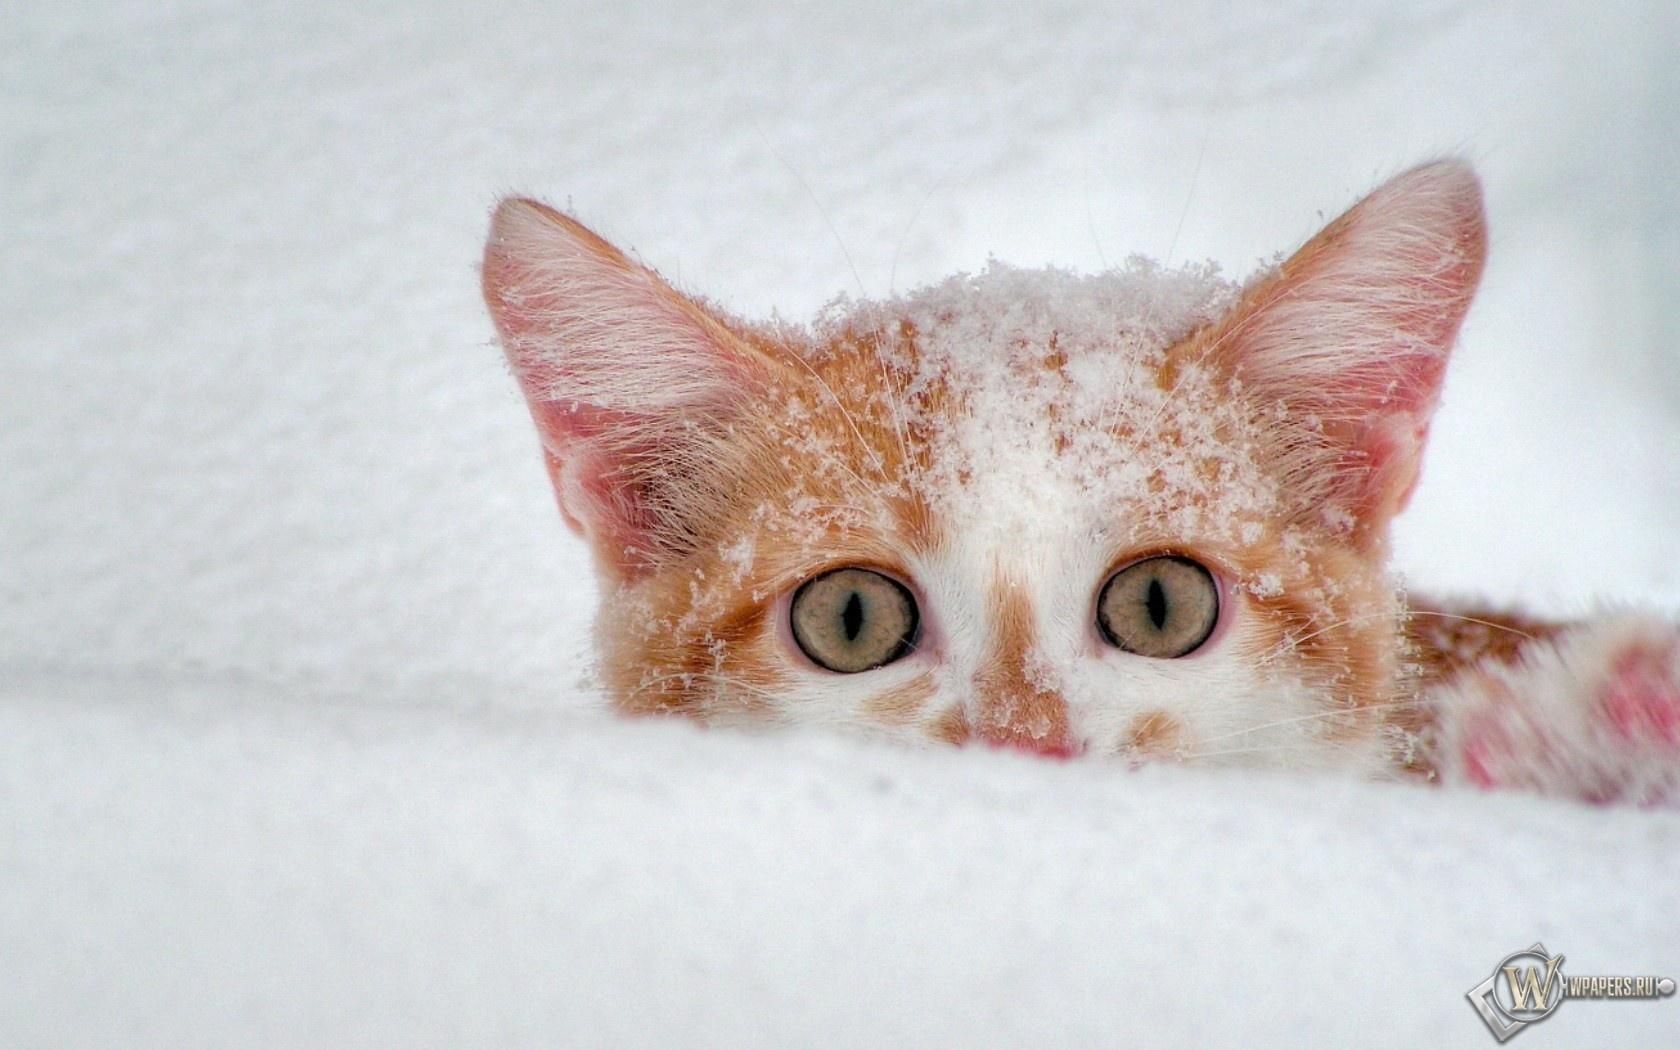 Котёнок в снегу 1680x1050